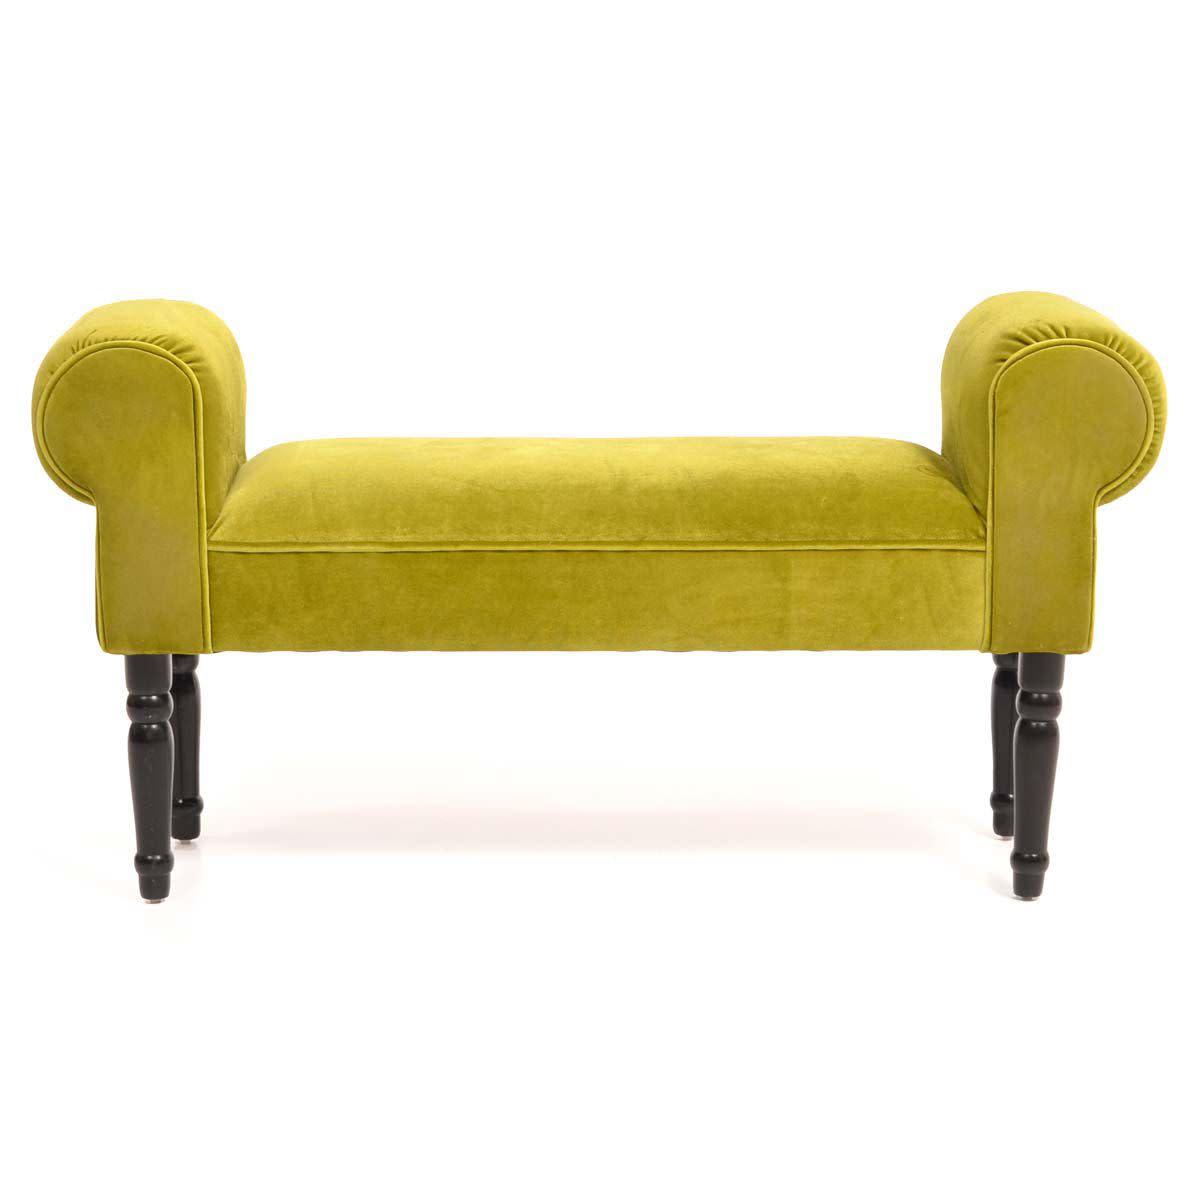 Sitzbank, gepolstert, Pappelholz, 98x52x31 cm (Impressionen)